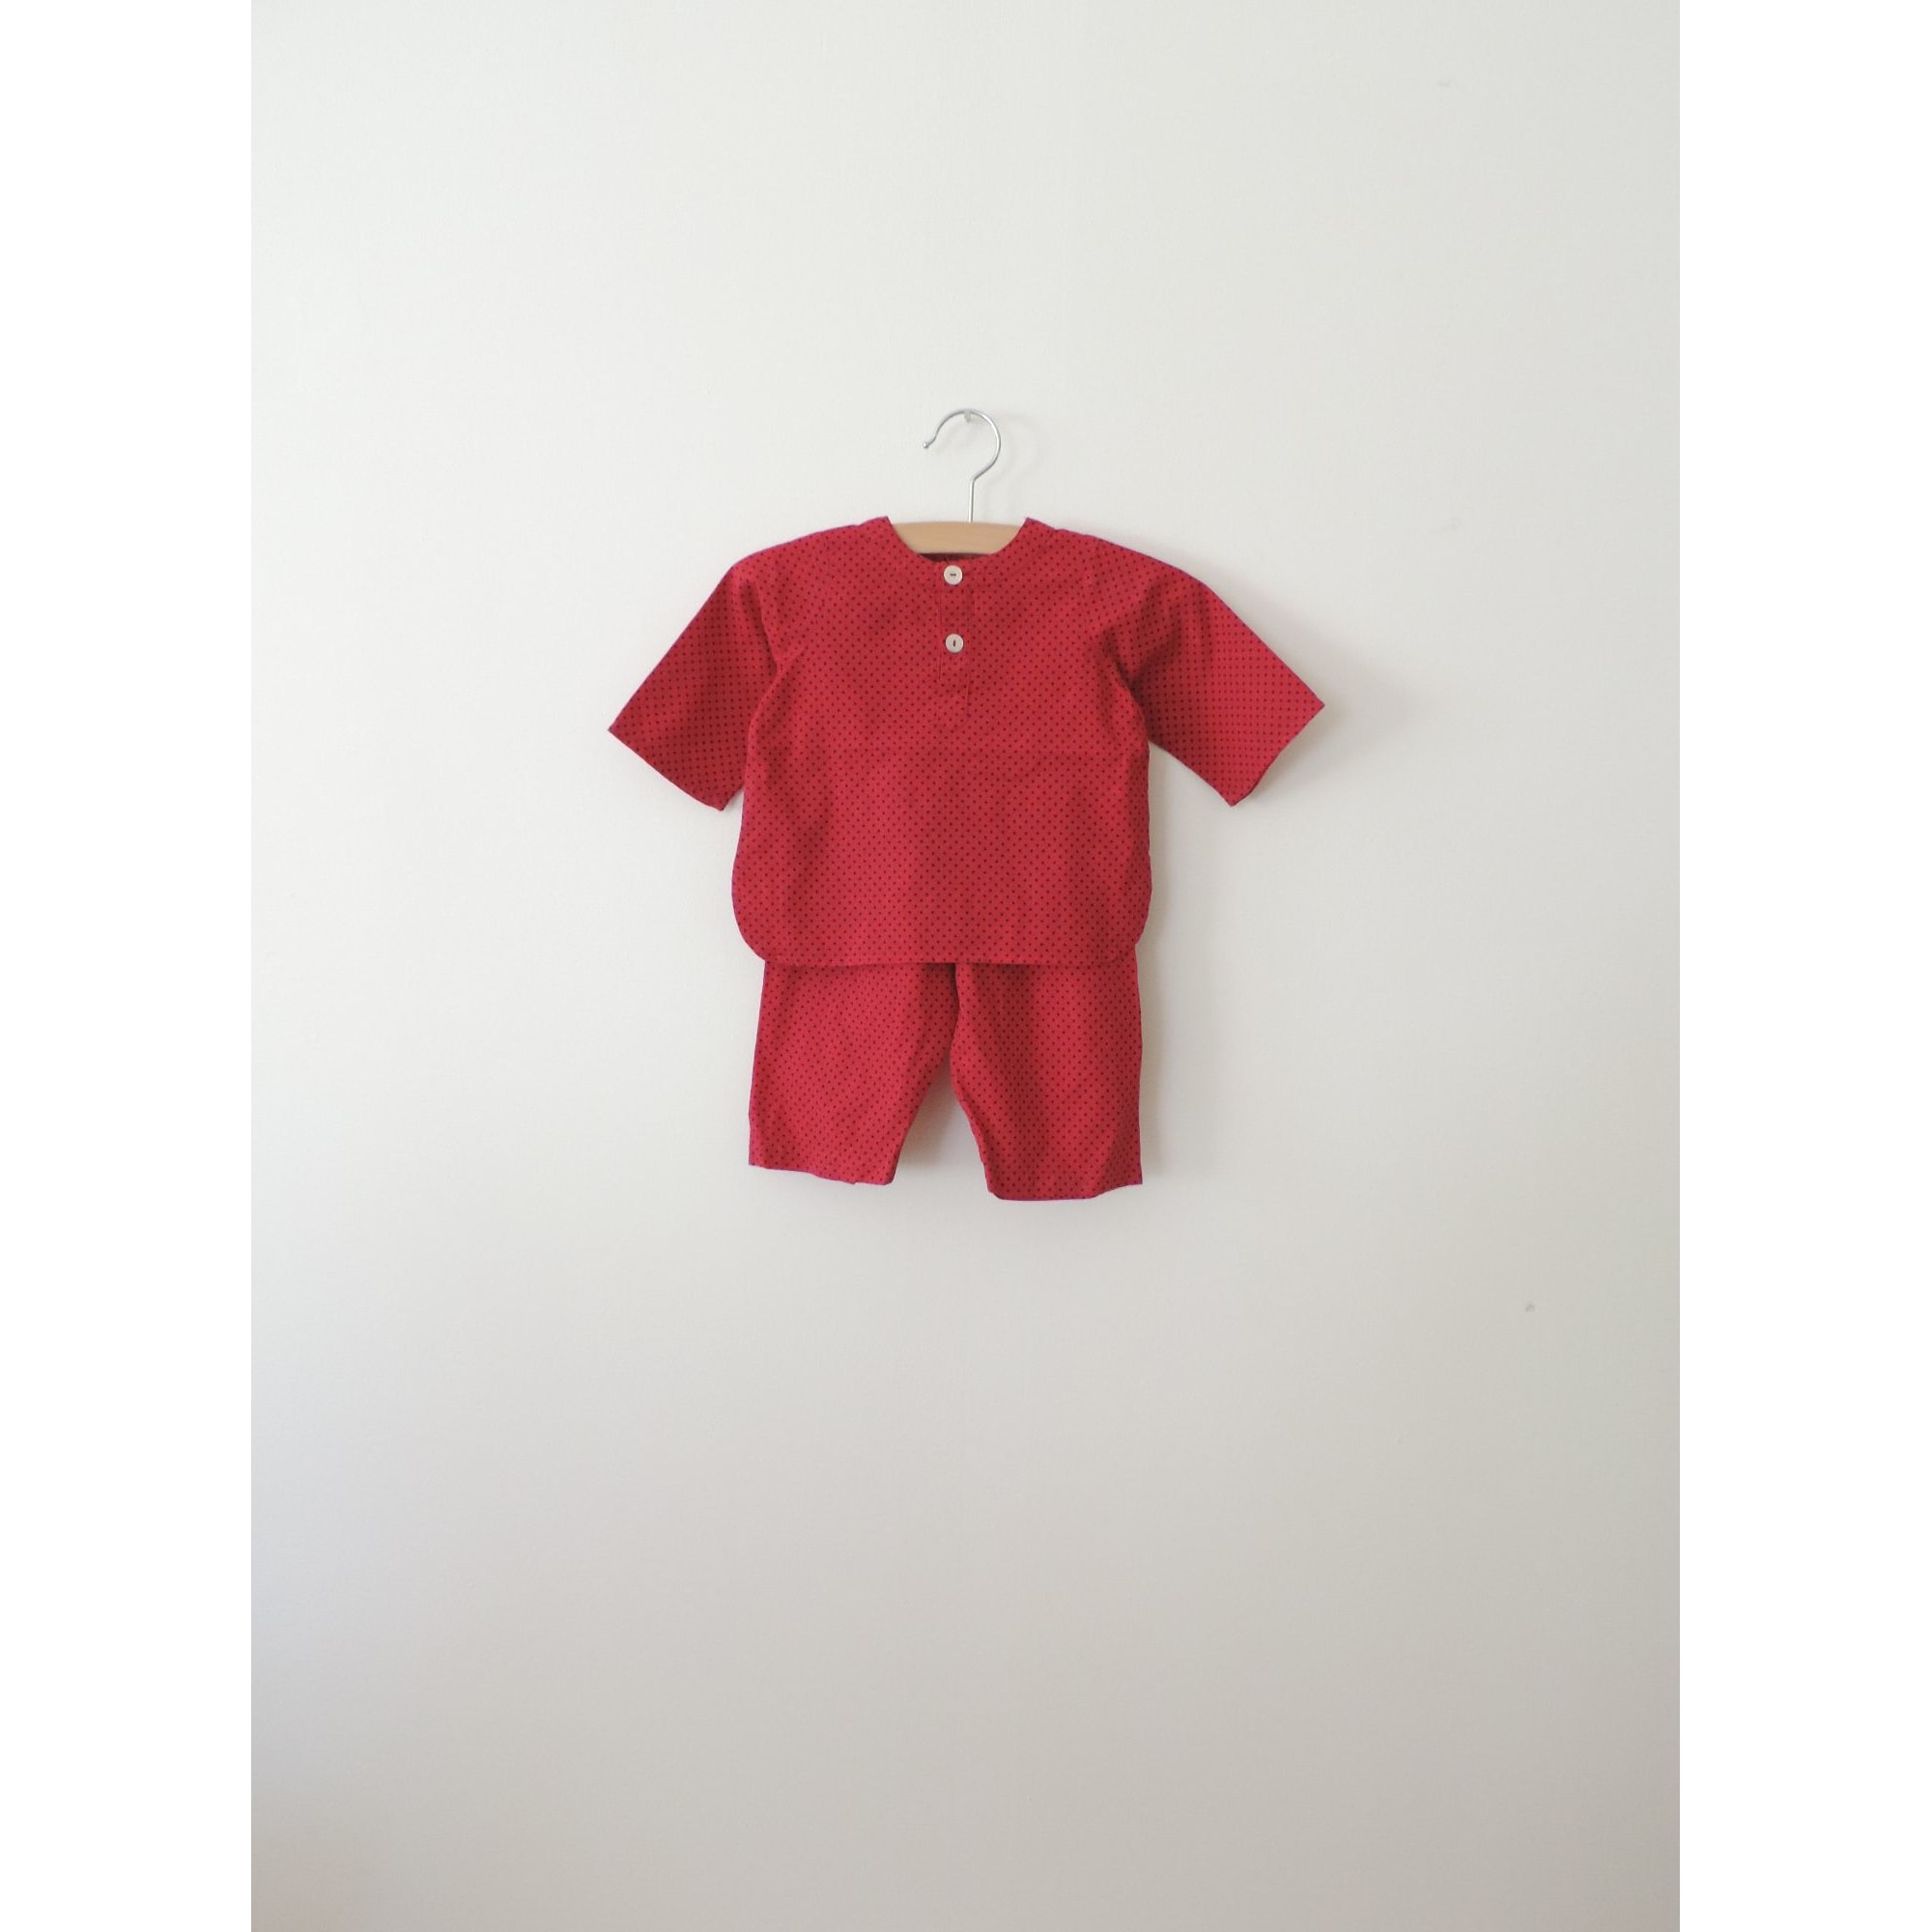 Ensemble & Combinaison pantalon BONTON Rouge, bordeaux